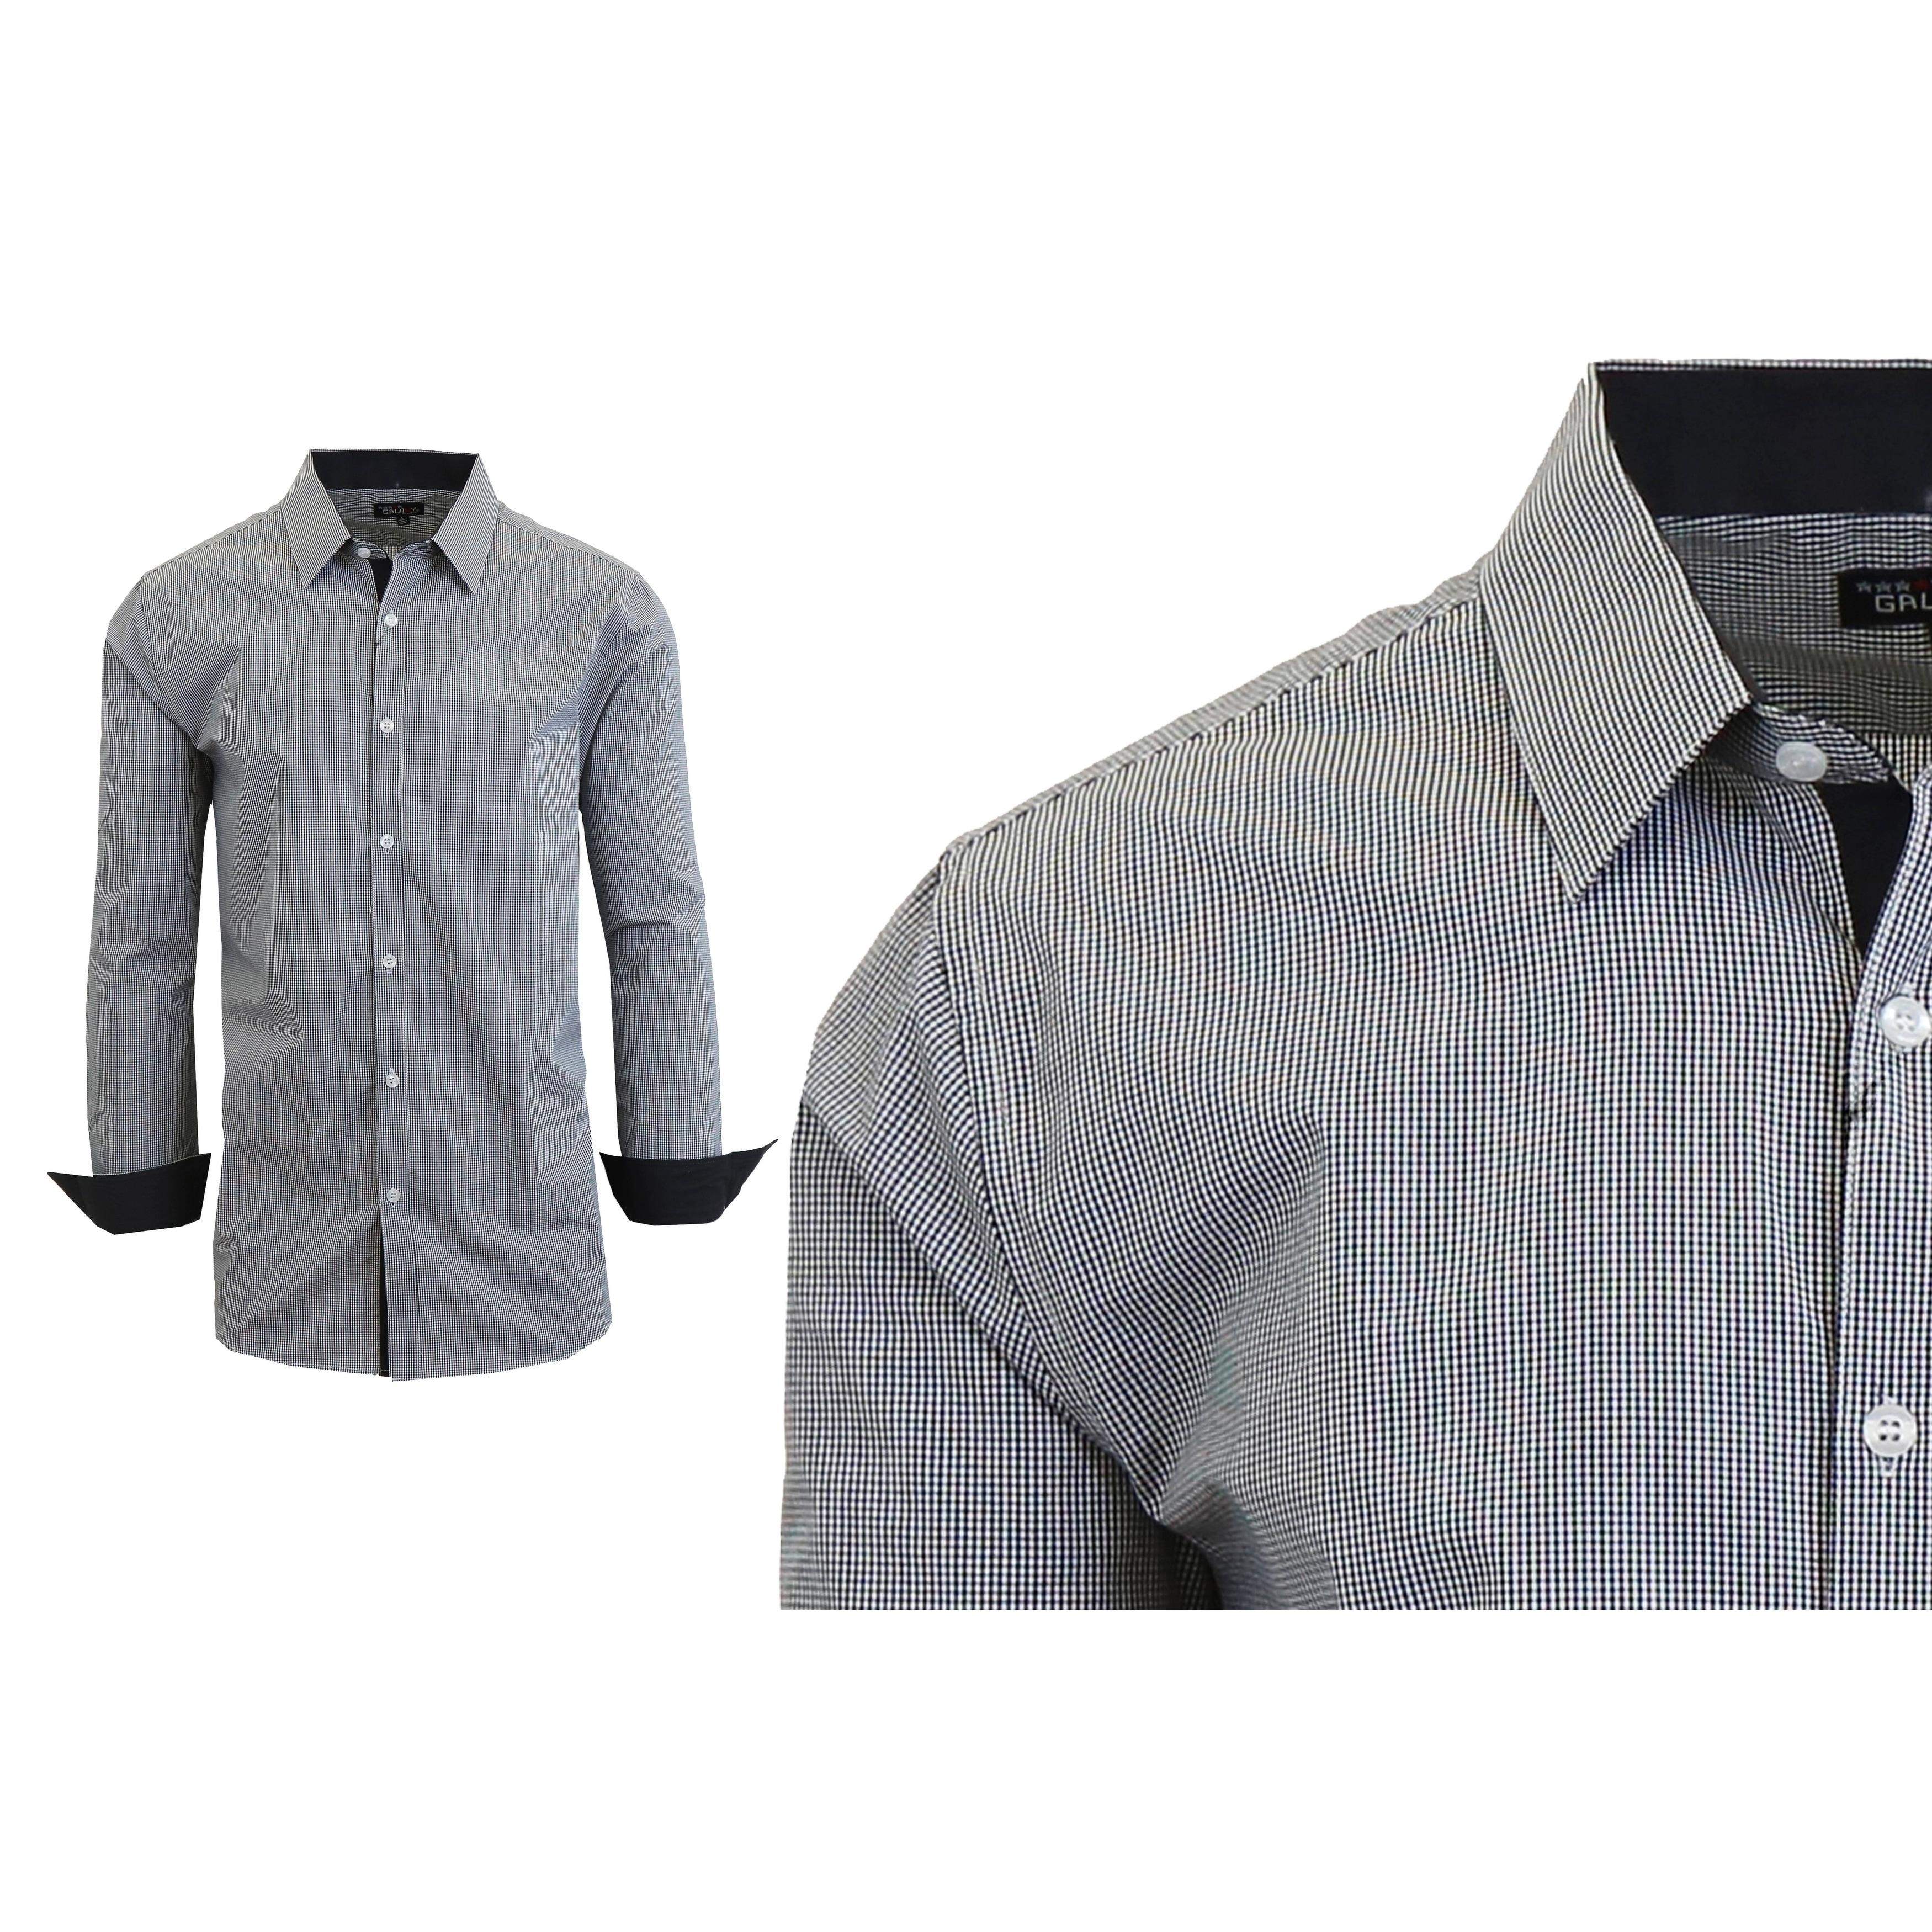 fa3dae360 Shop Galaxy By Harvic Men's Long Sleeve Plaid Button Down Dress ...